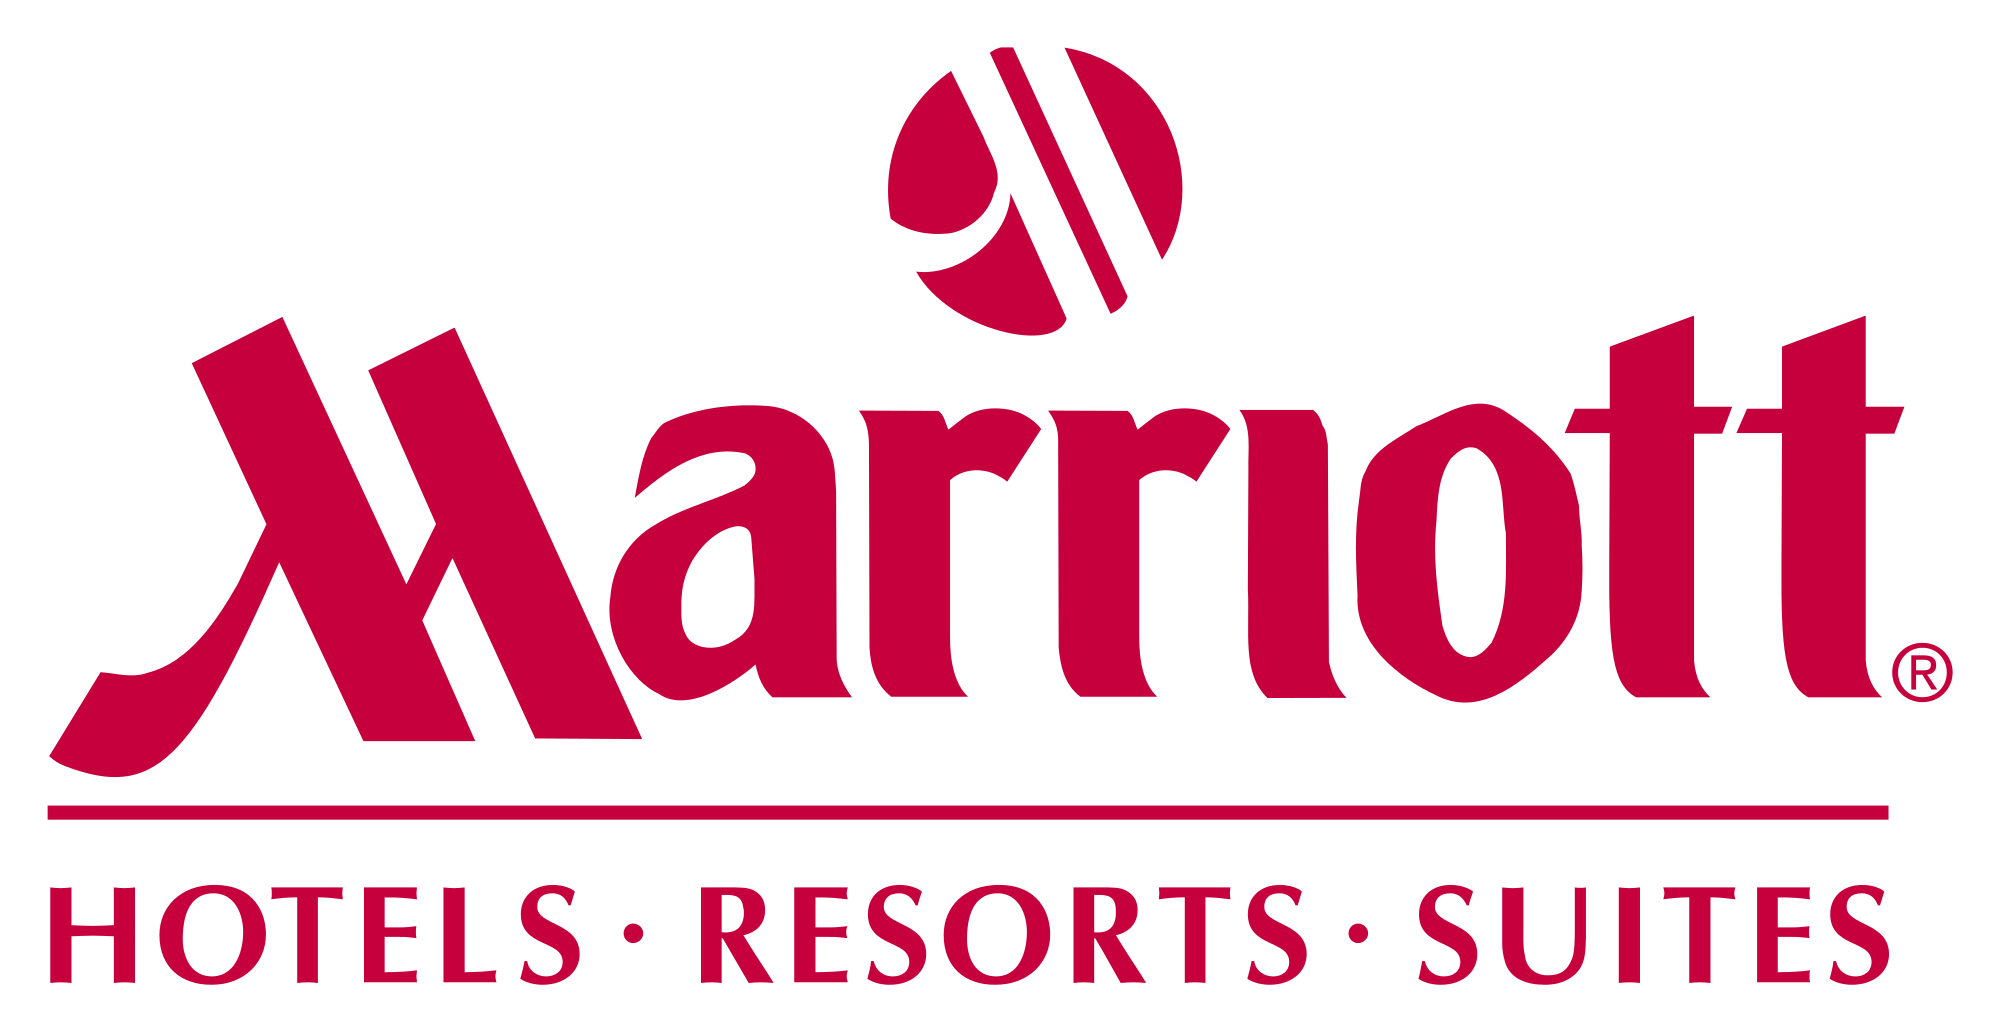 marriott-hotel-logo.png